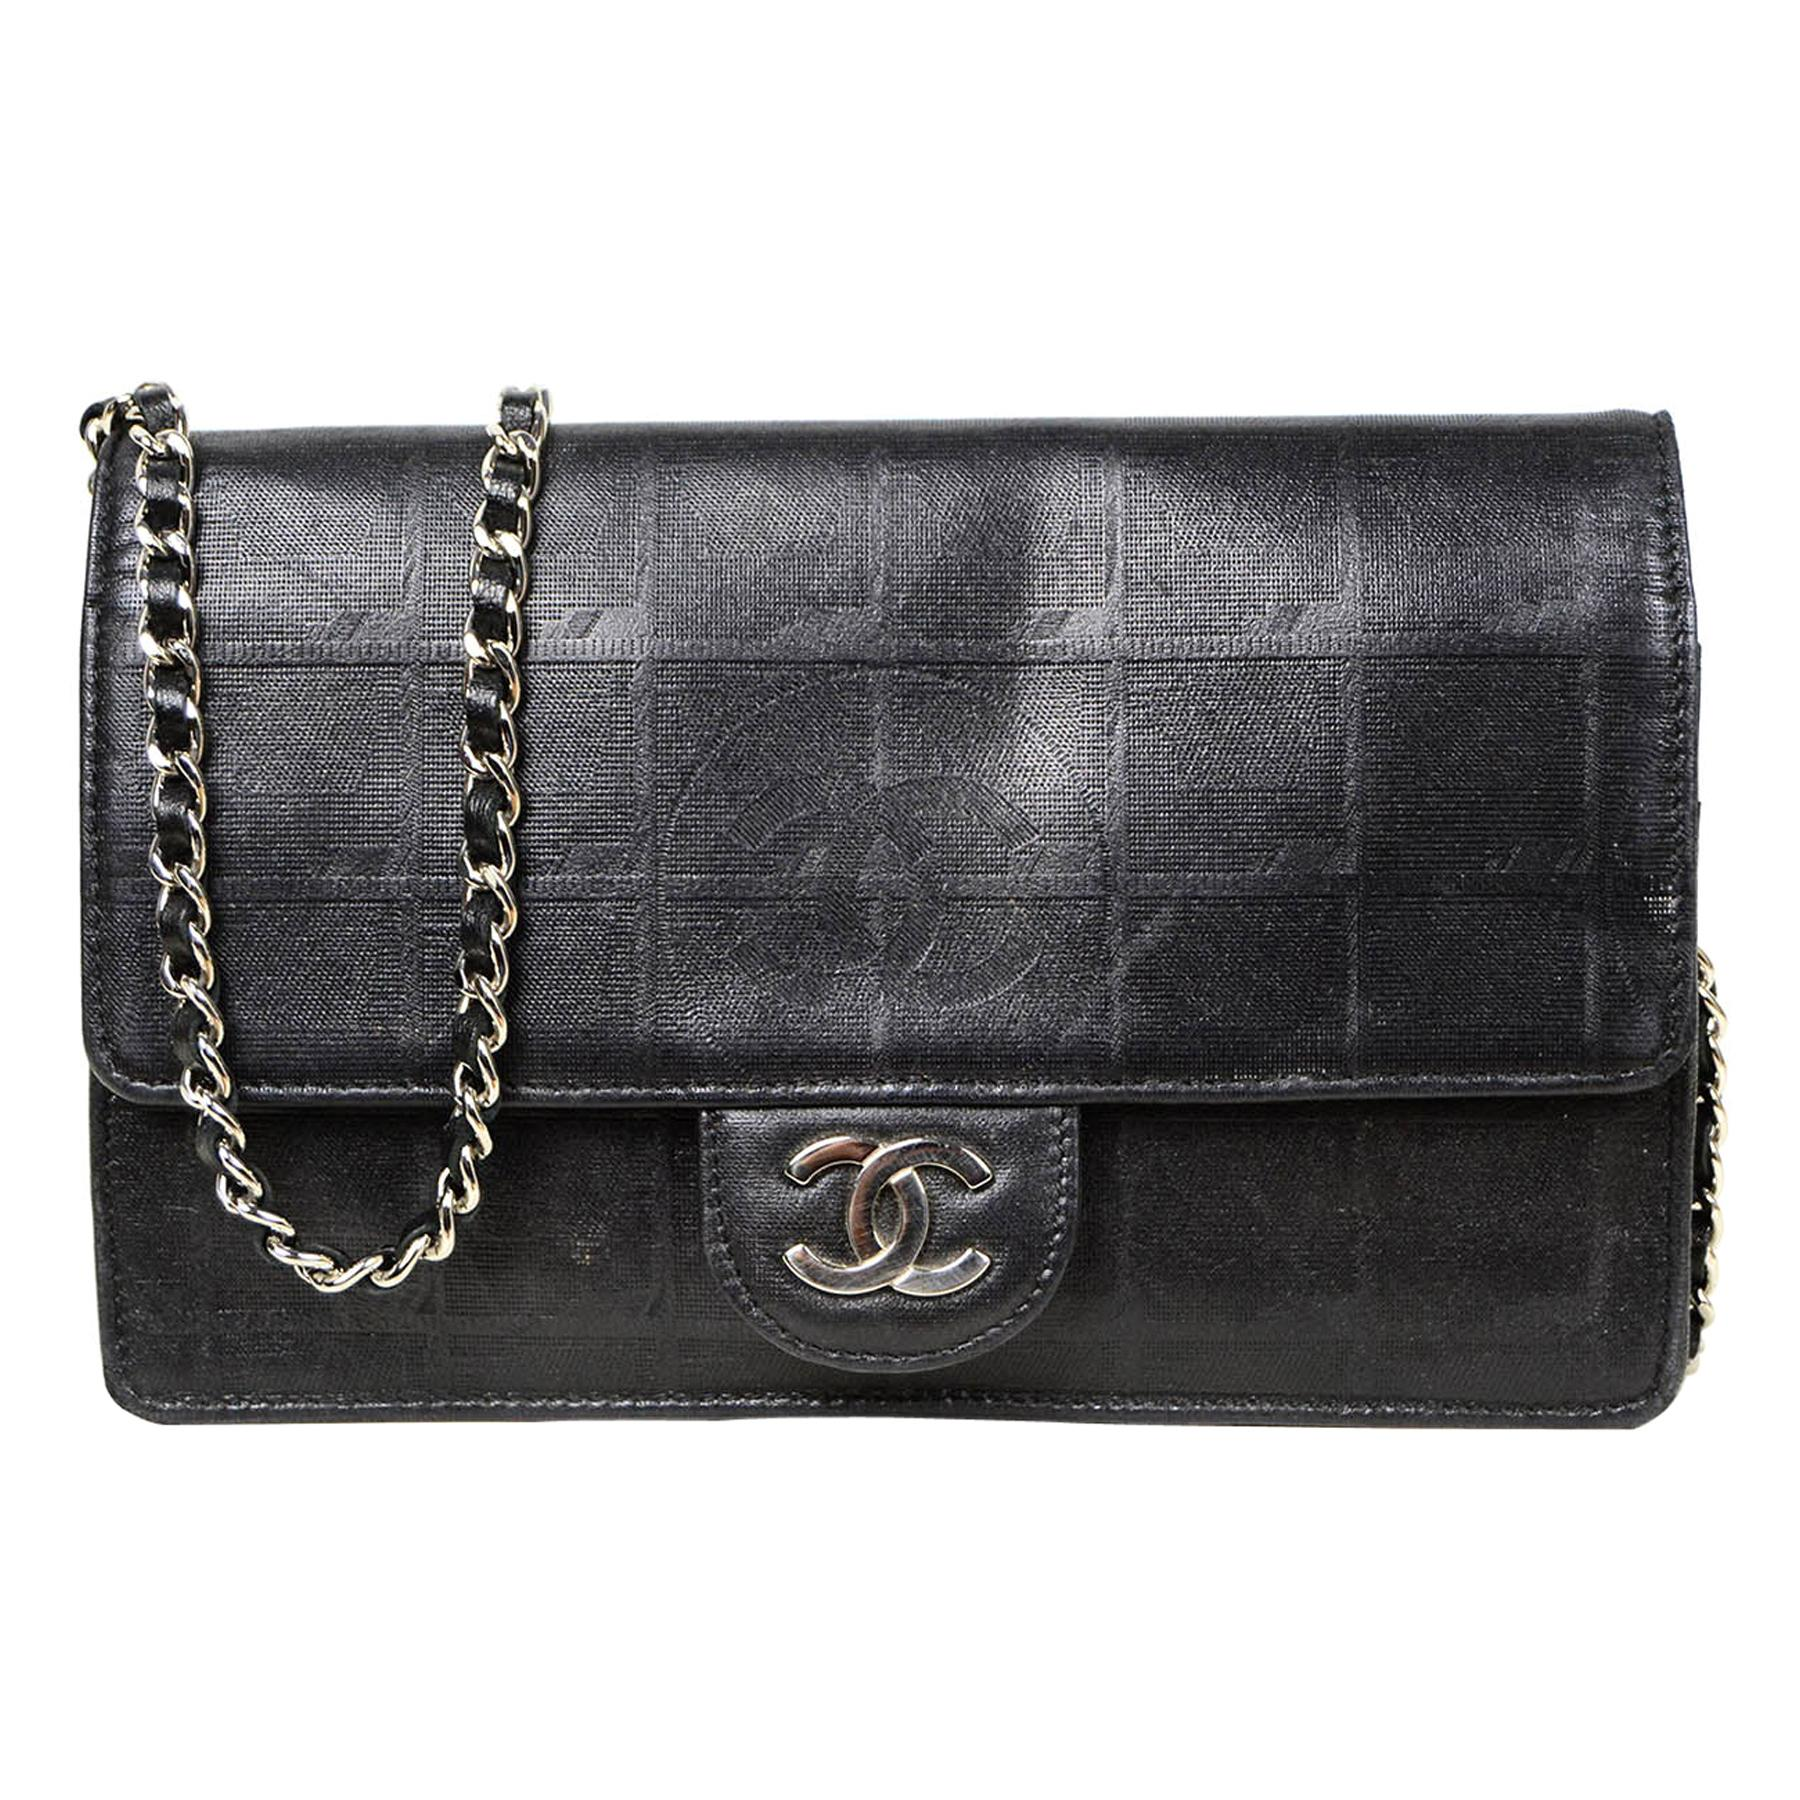 Chanel Metallic Black Nylon Travel Ligne CC Wallet on Chain WOC Crossbody Bag